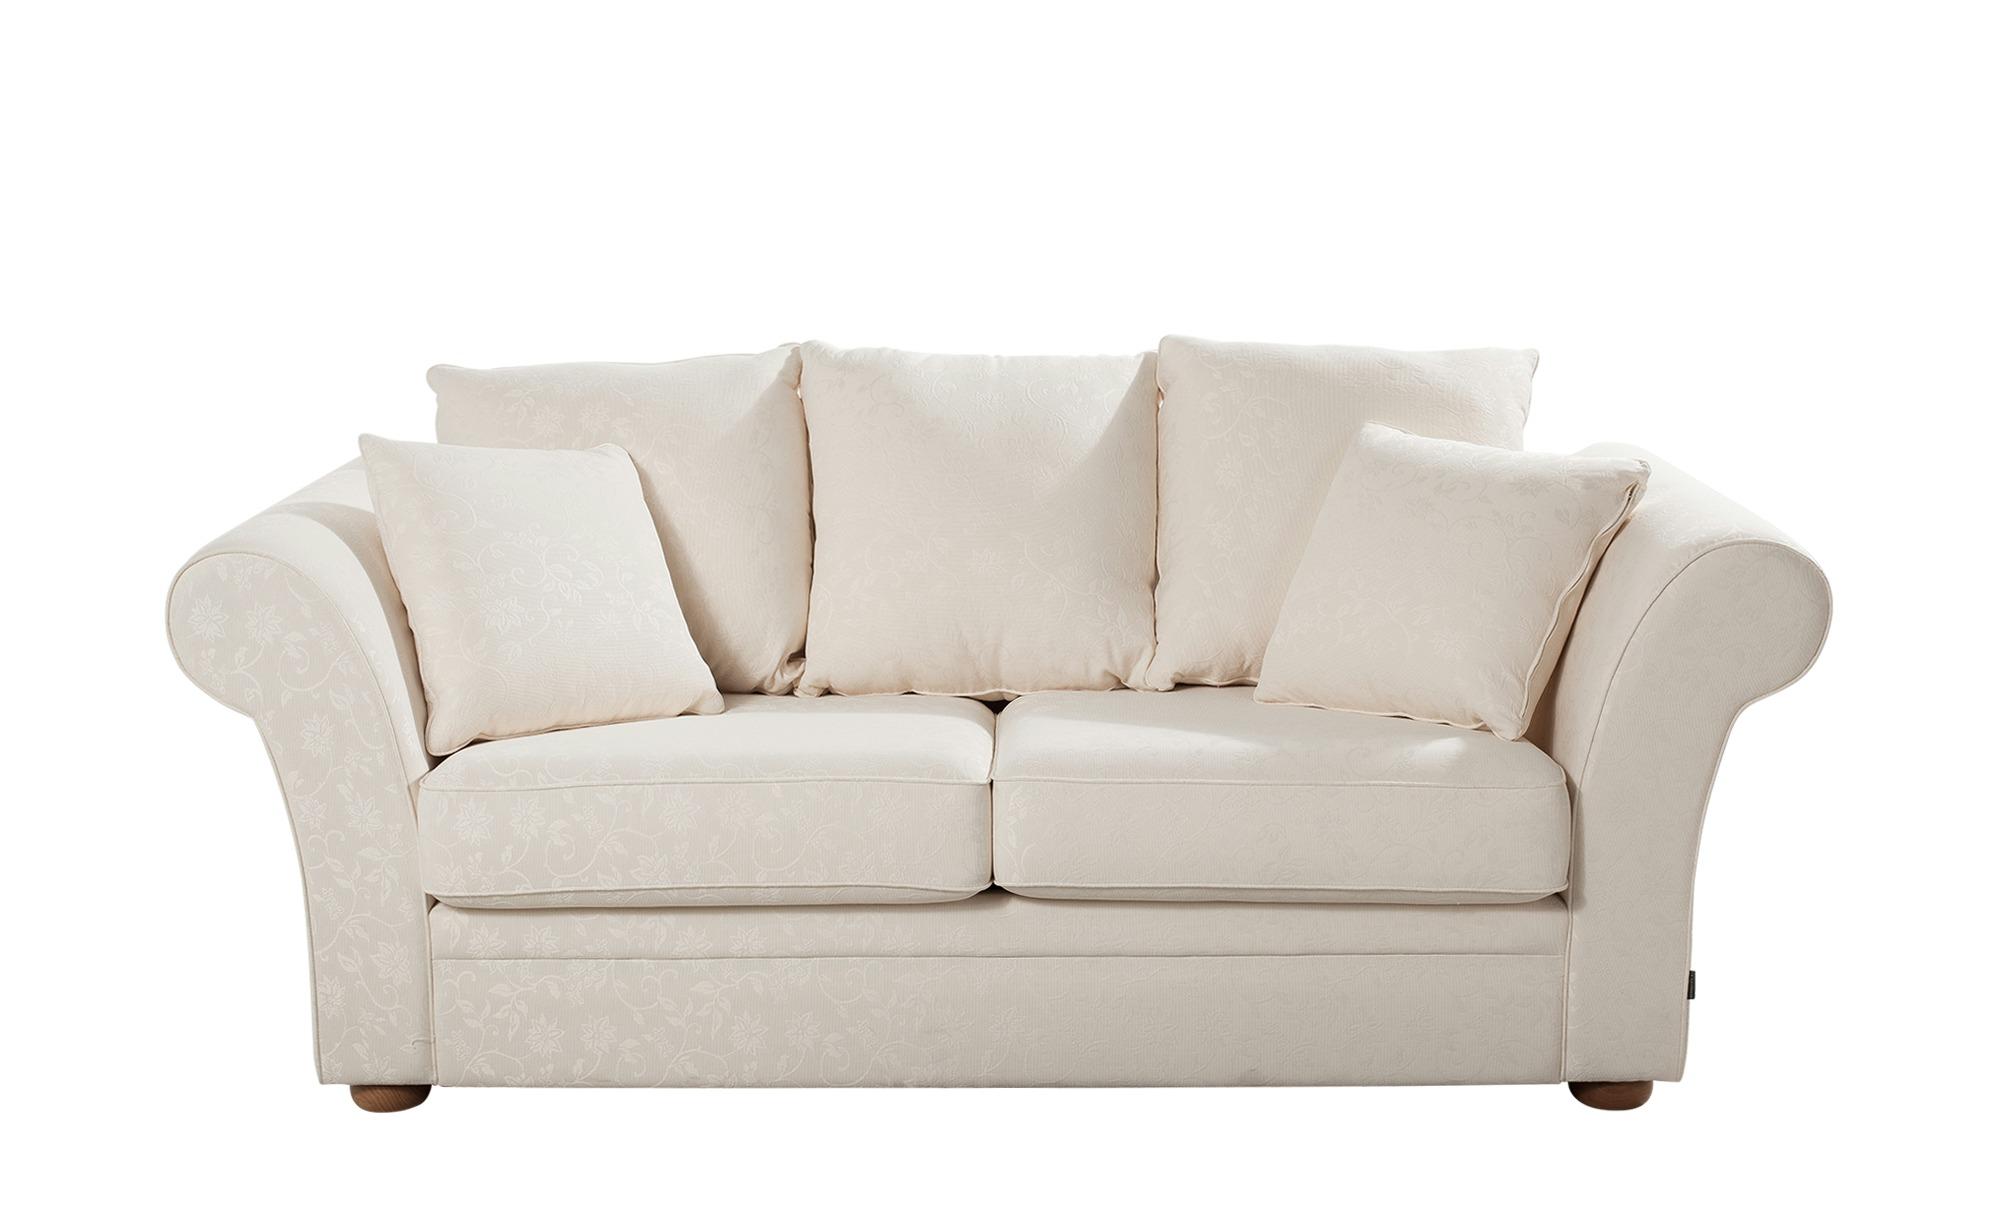 soho landhaus sofa wei flachgewebe olivia wei 2 5. Black Bedroom Furniture Sets. Home Design Ideas